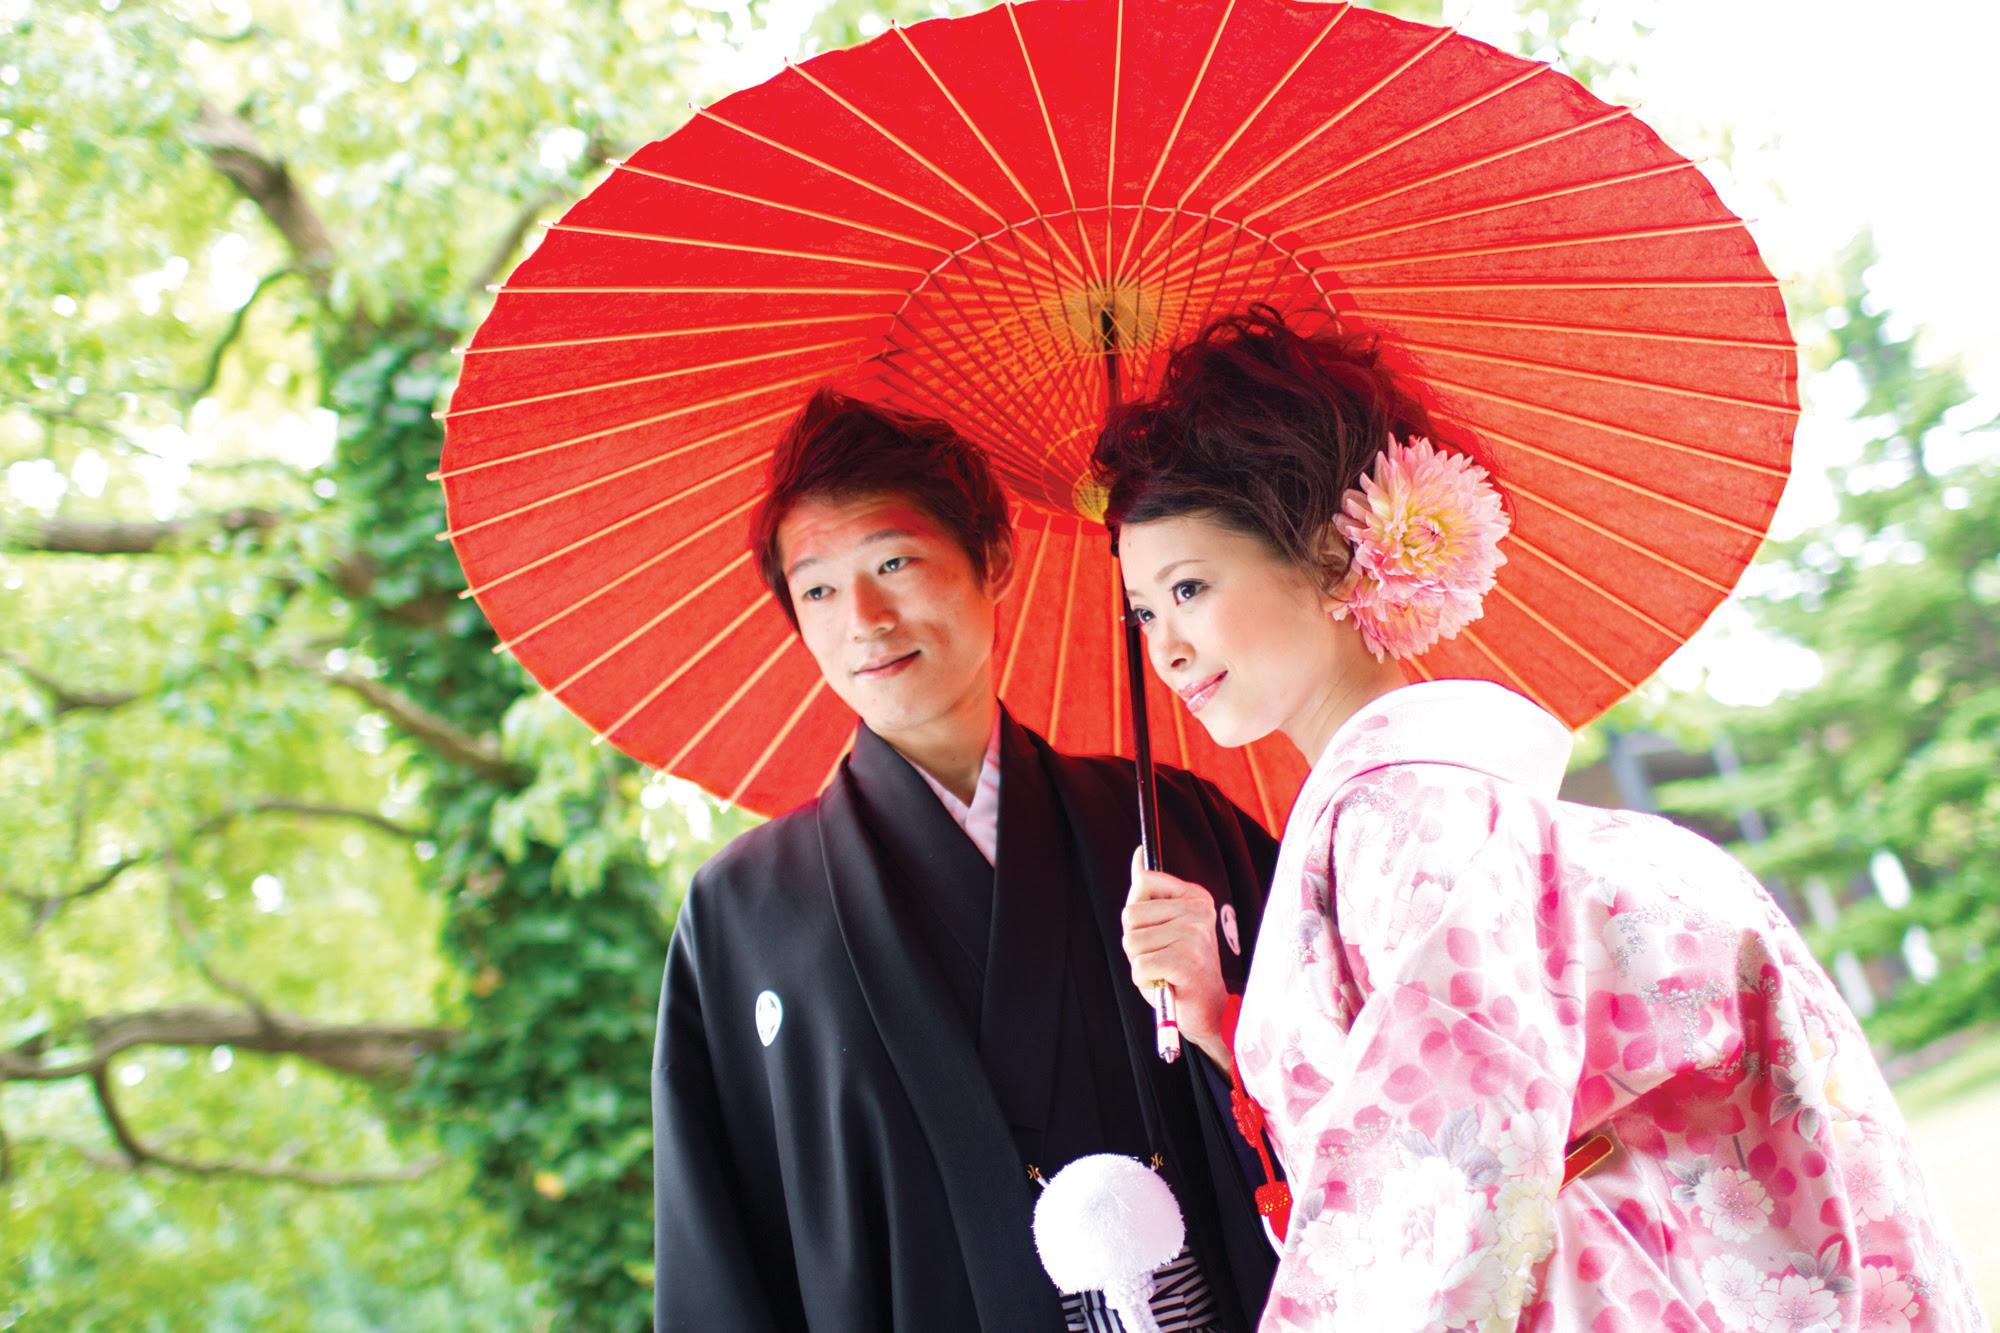 Japanese Wedding Traditions